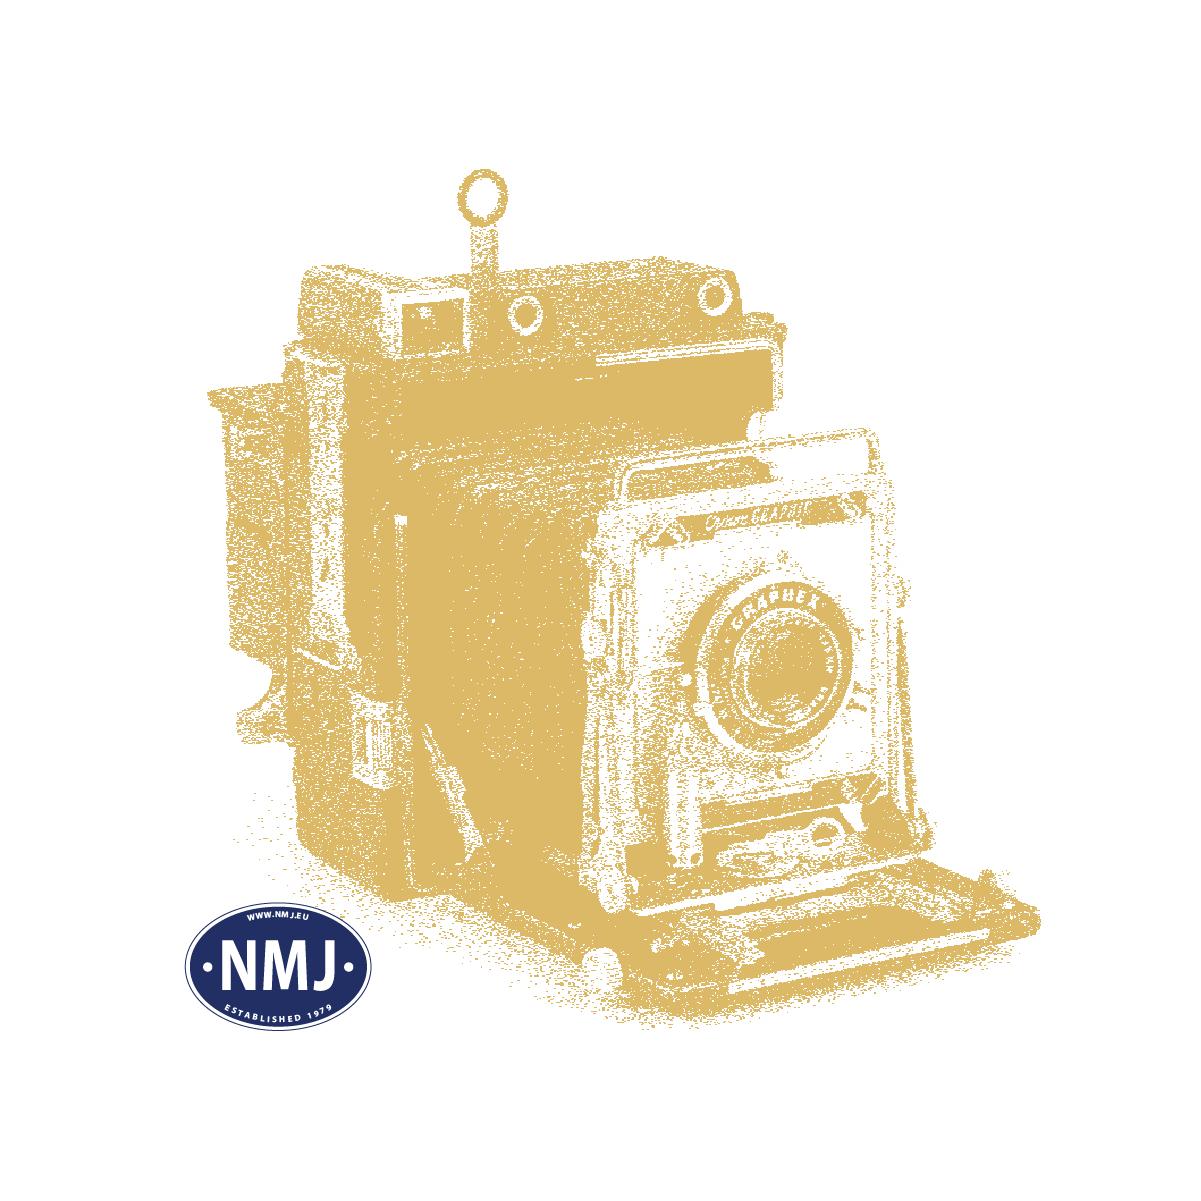 Superline Lokomotiver, nmj-superline-nsb-30b-364-dc-nmjs30b364-dcc-sound, NMJS30b364